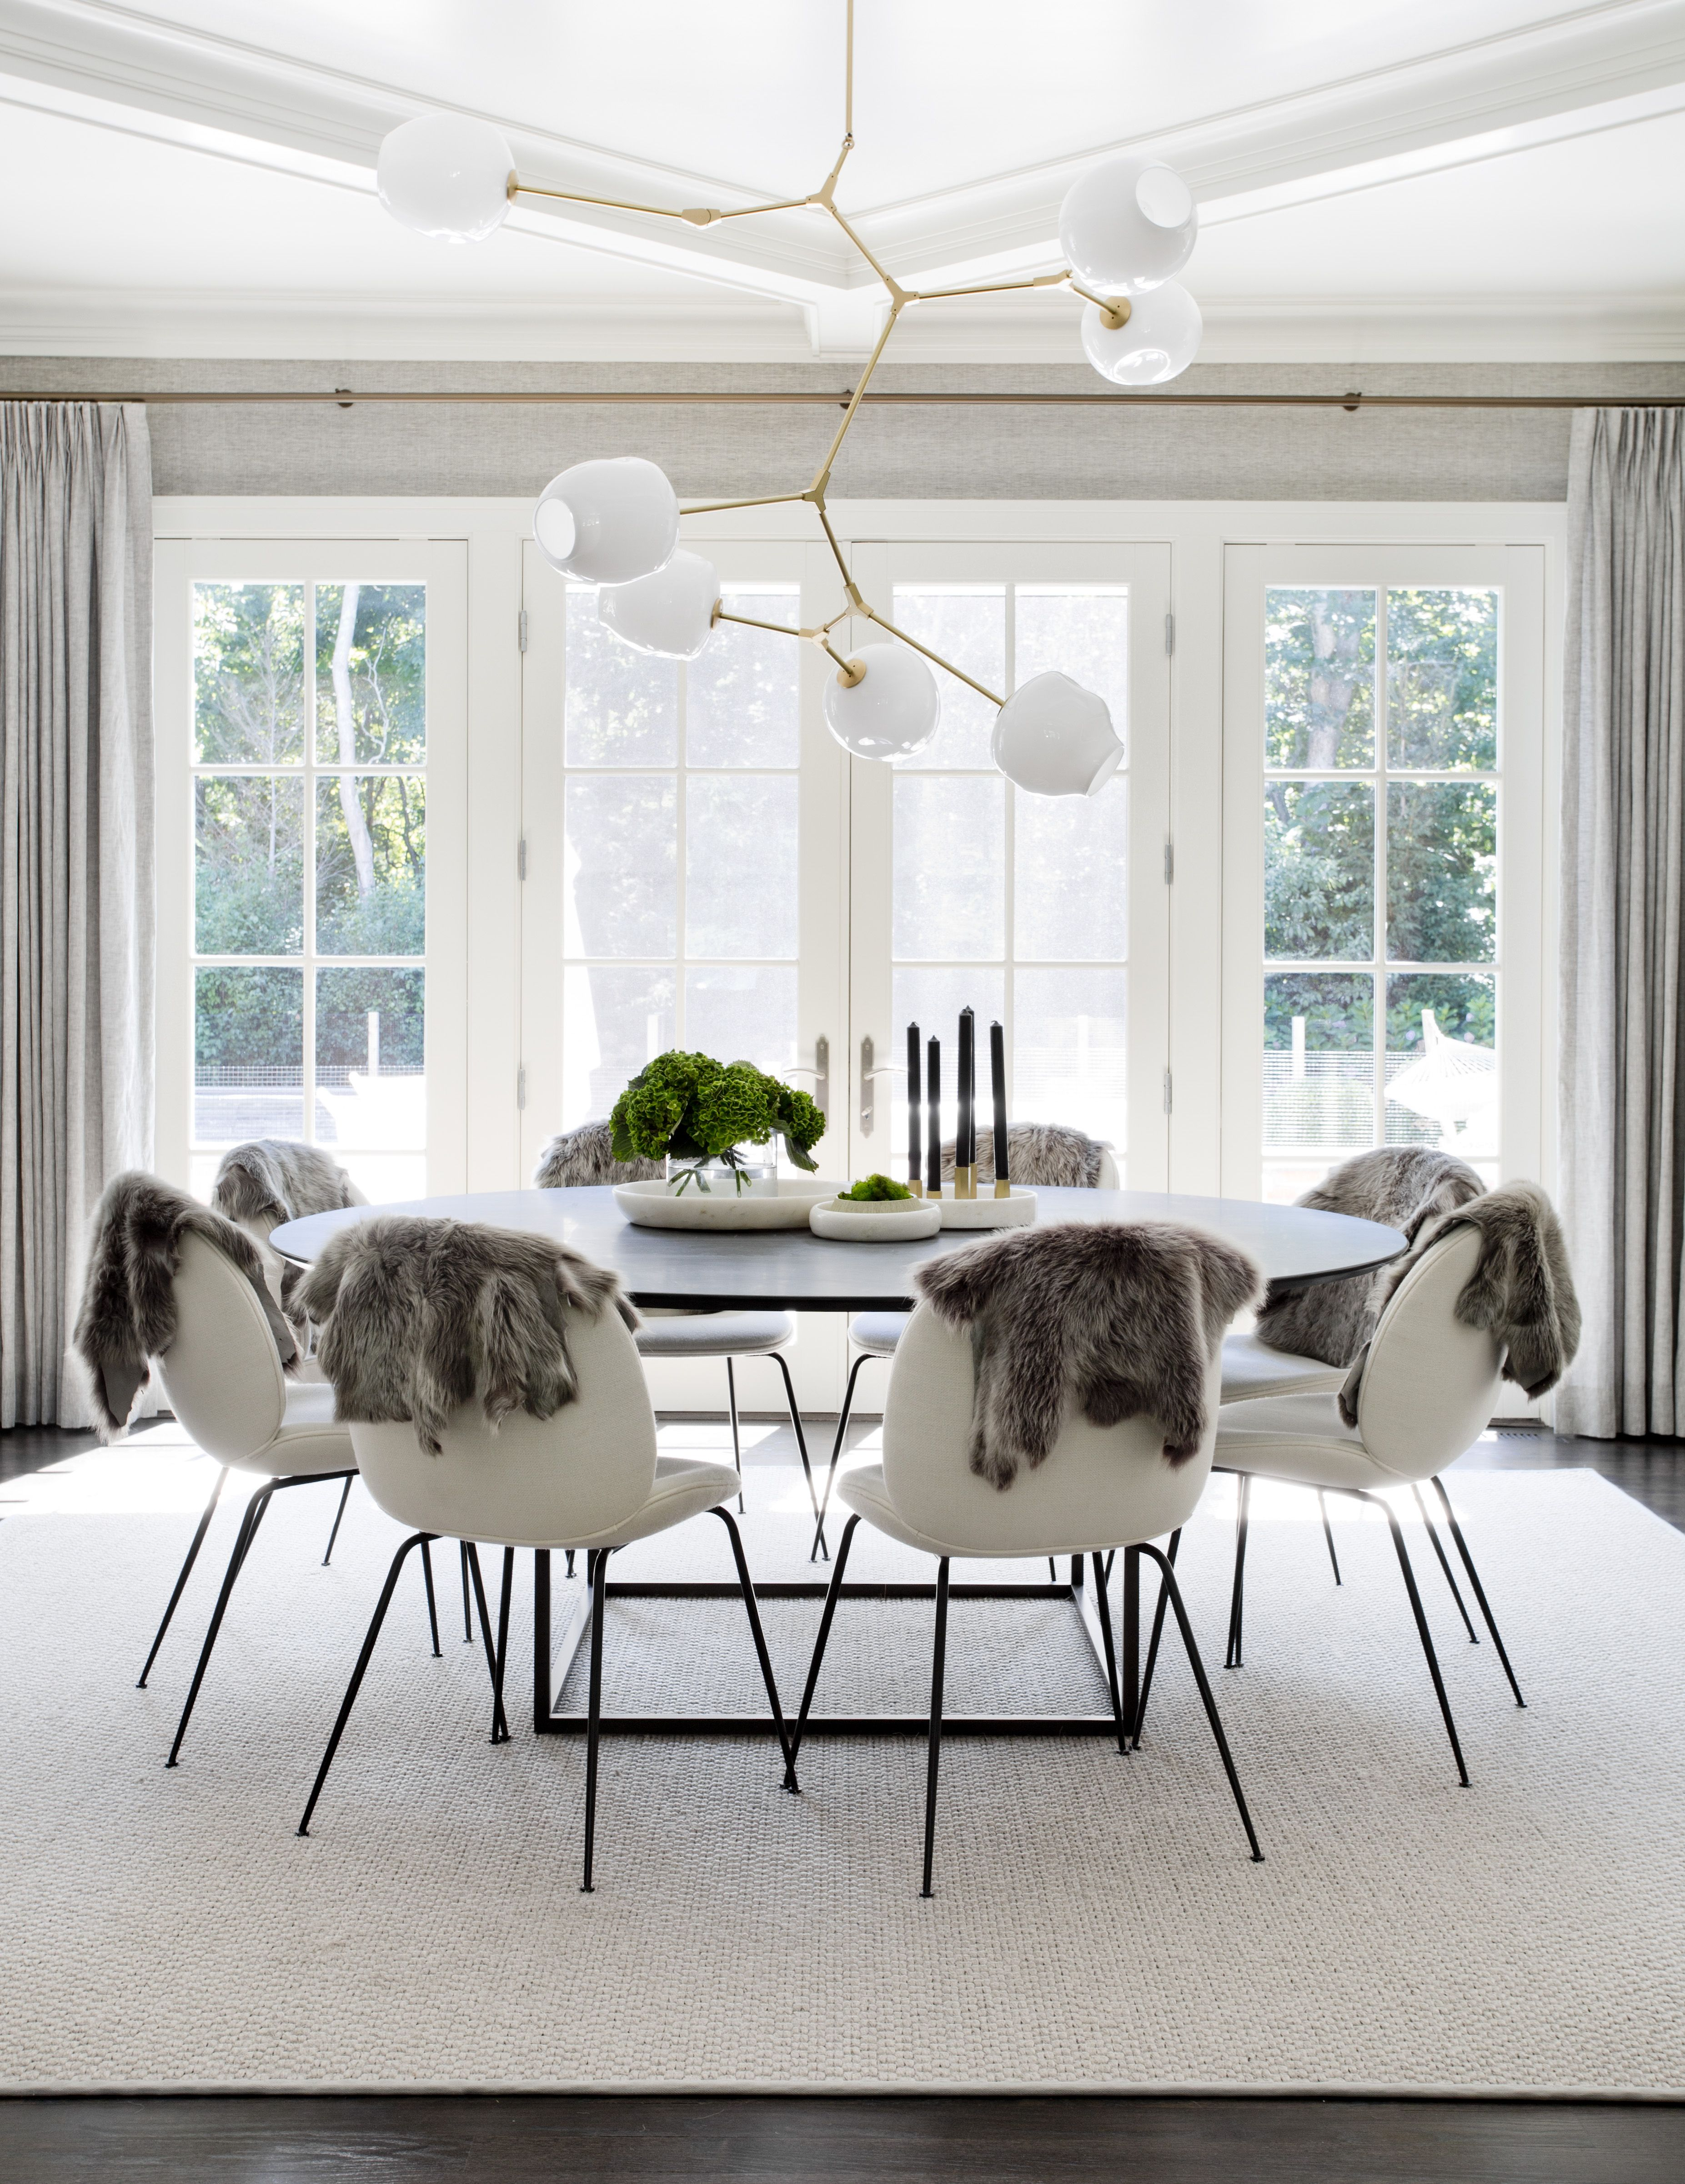 tamara magel interiors/ sag harbor lindsey adelman light | dining